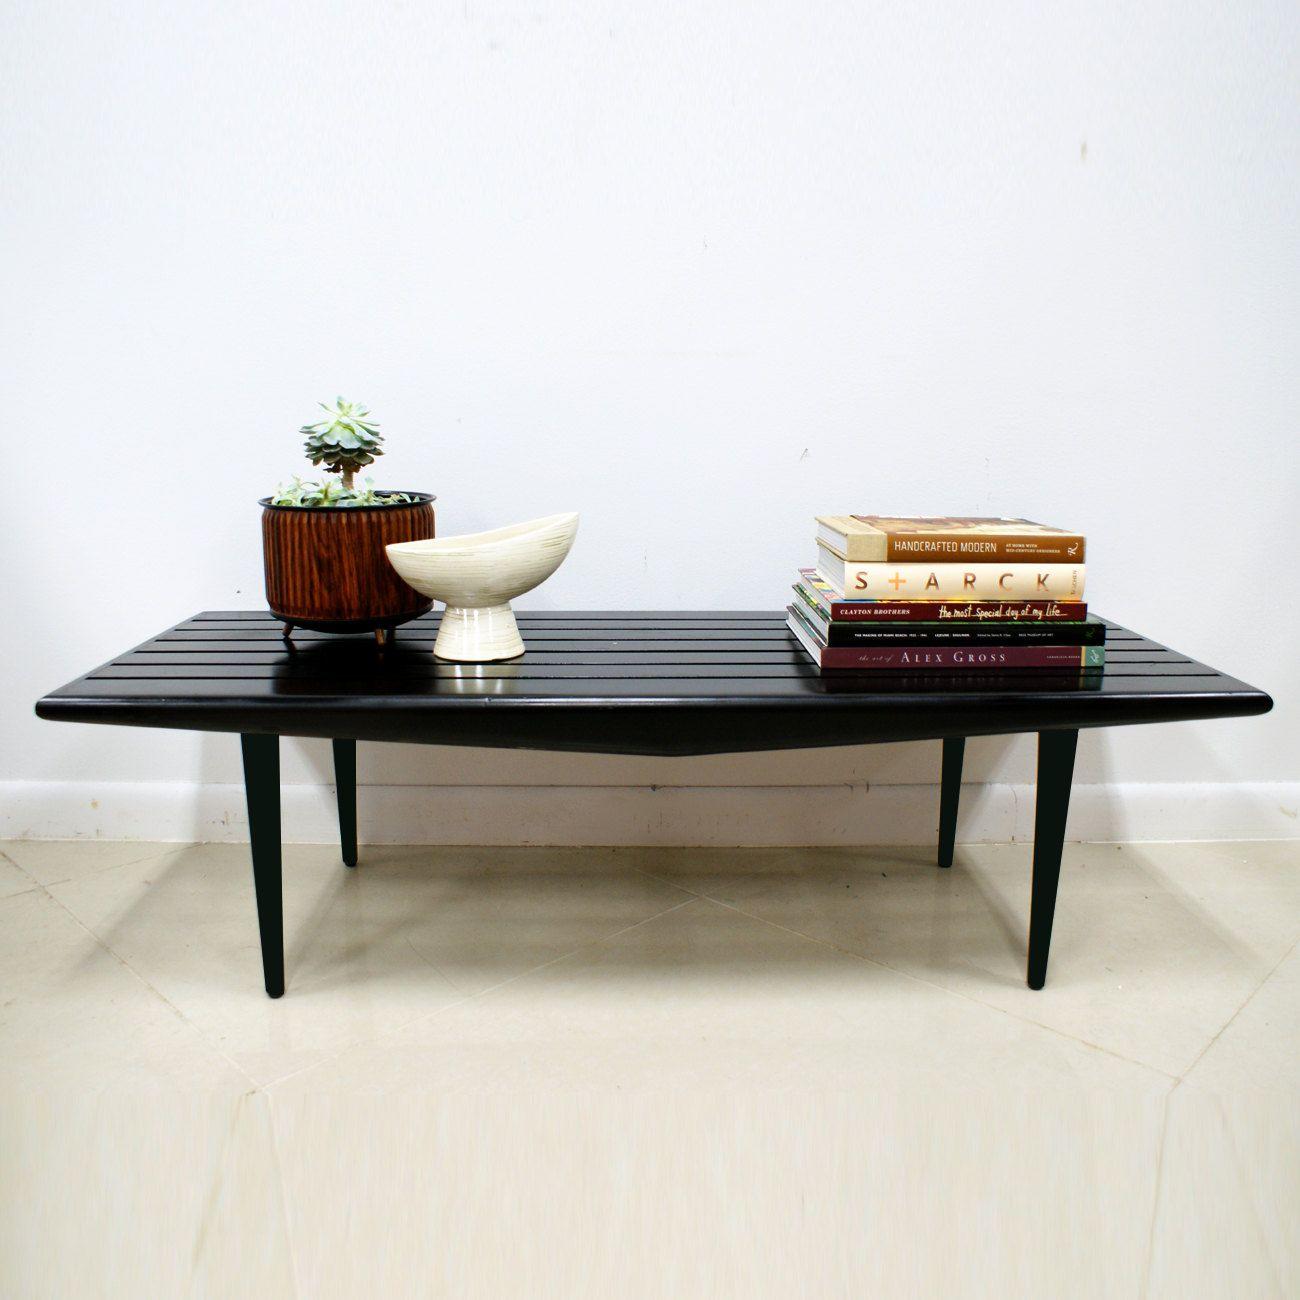 Sale Vintage Mid Century Modern Black Slat Bench Coffee Table Etsy Coffee Table Mid Century Modern Decor Patio Lounge Chairs [ 1300 x 1300 Pixel ]